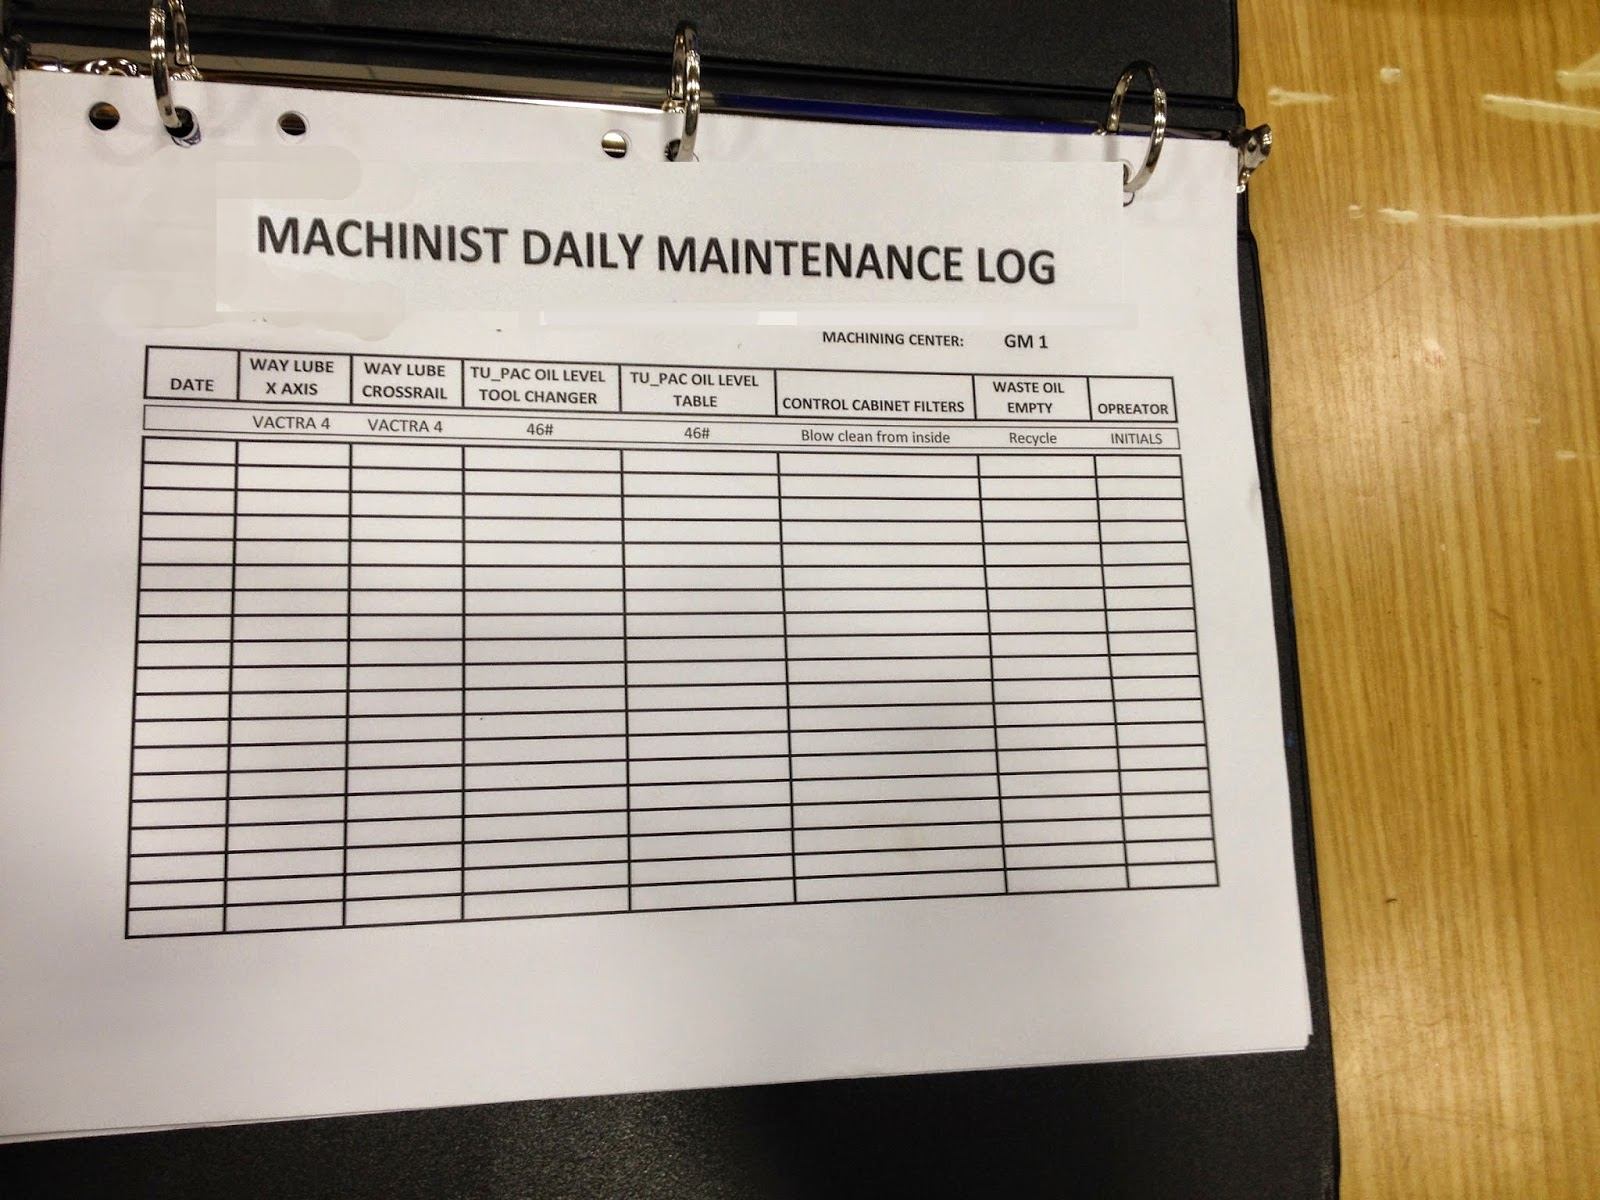 engineering and machining operator maintenance and accountablilty